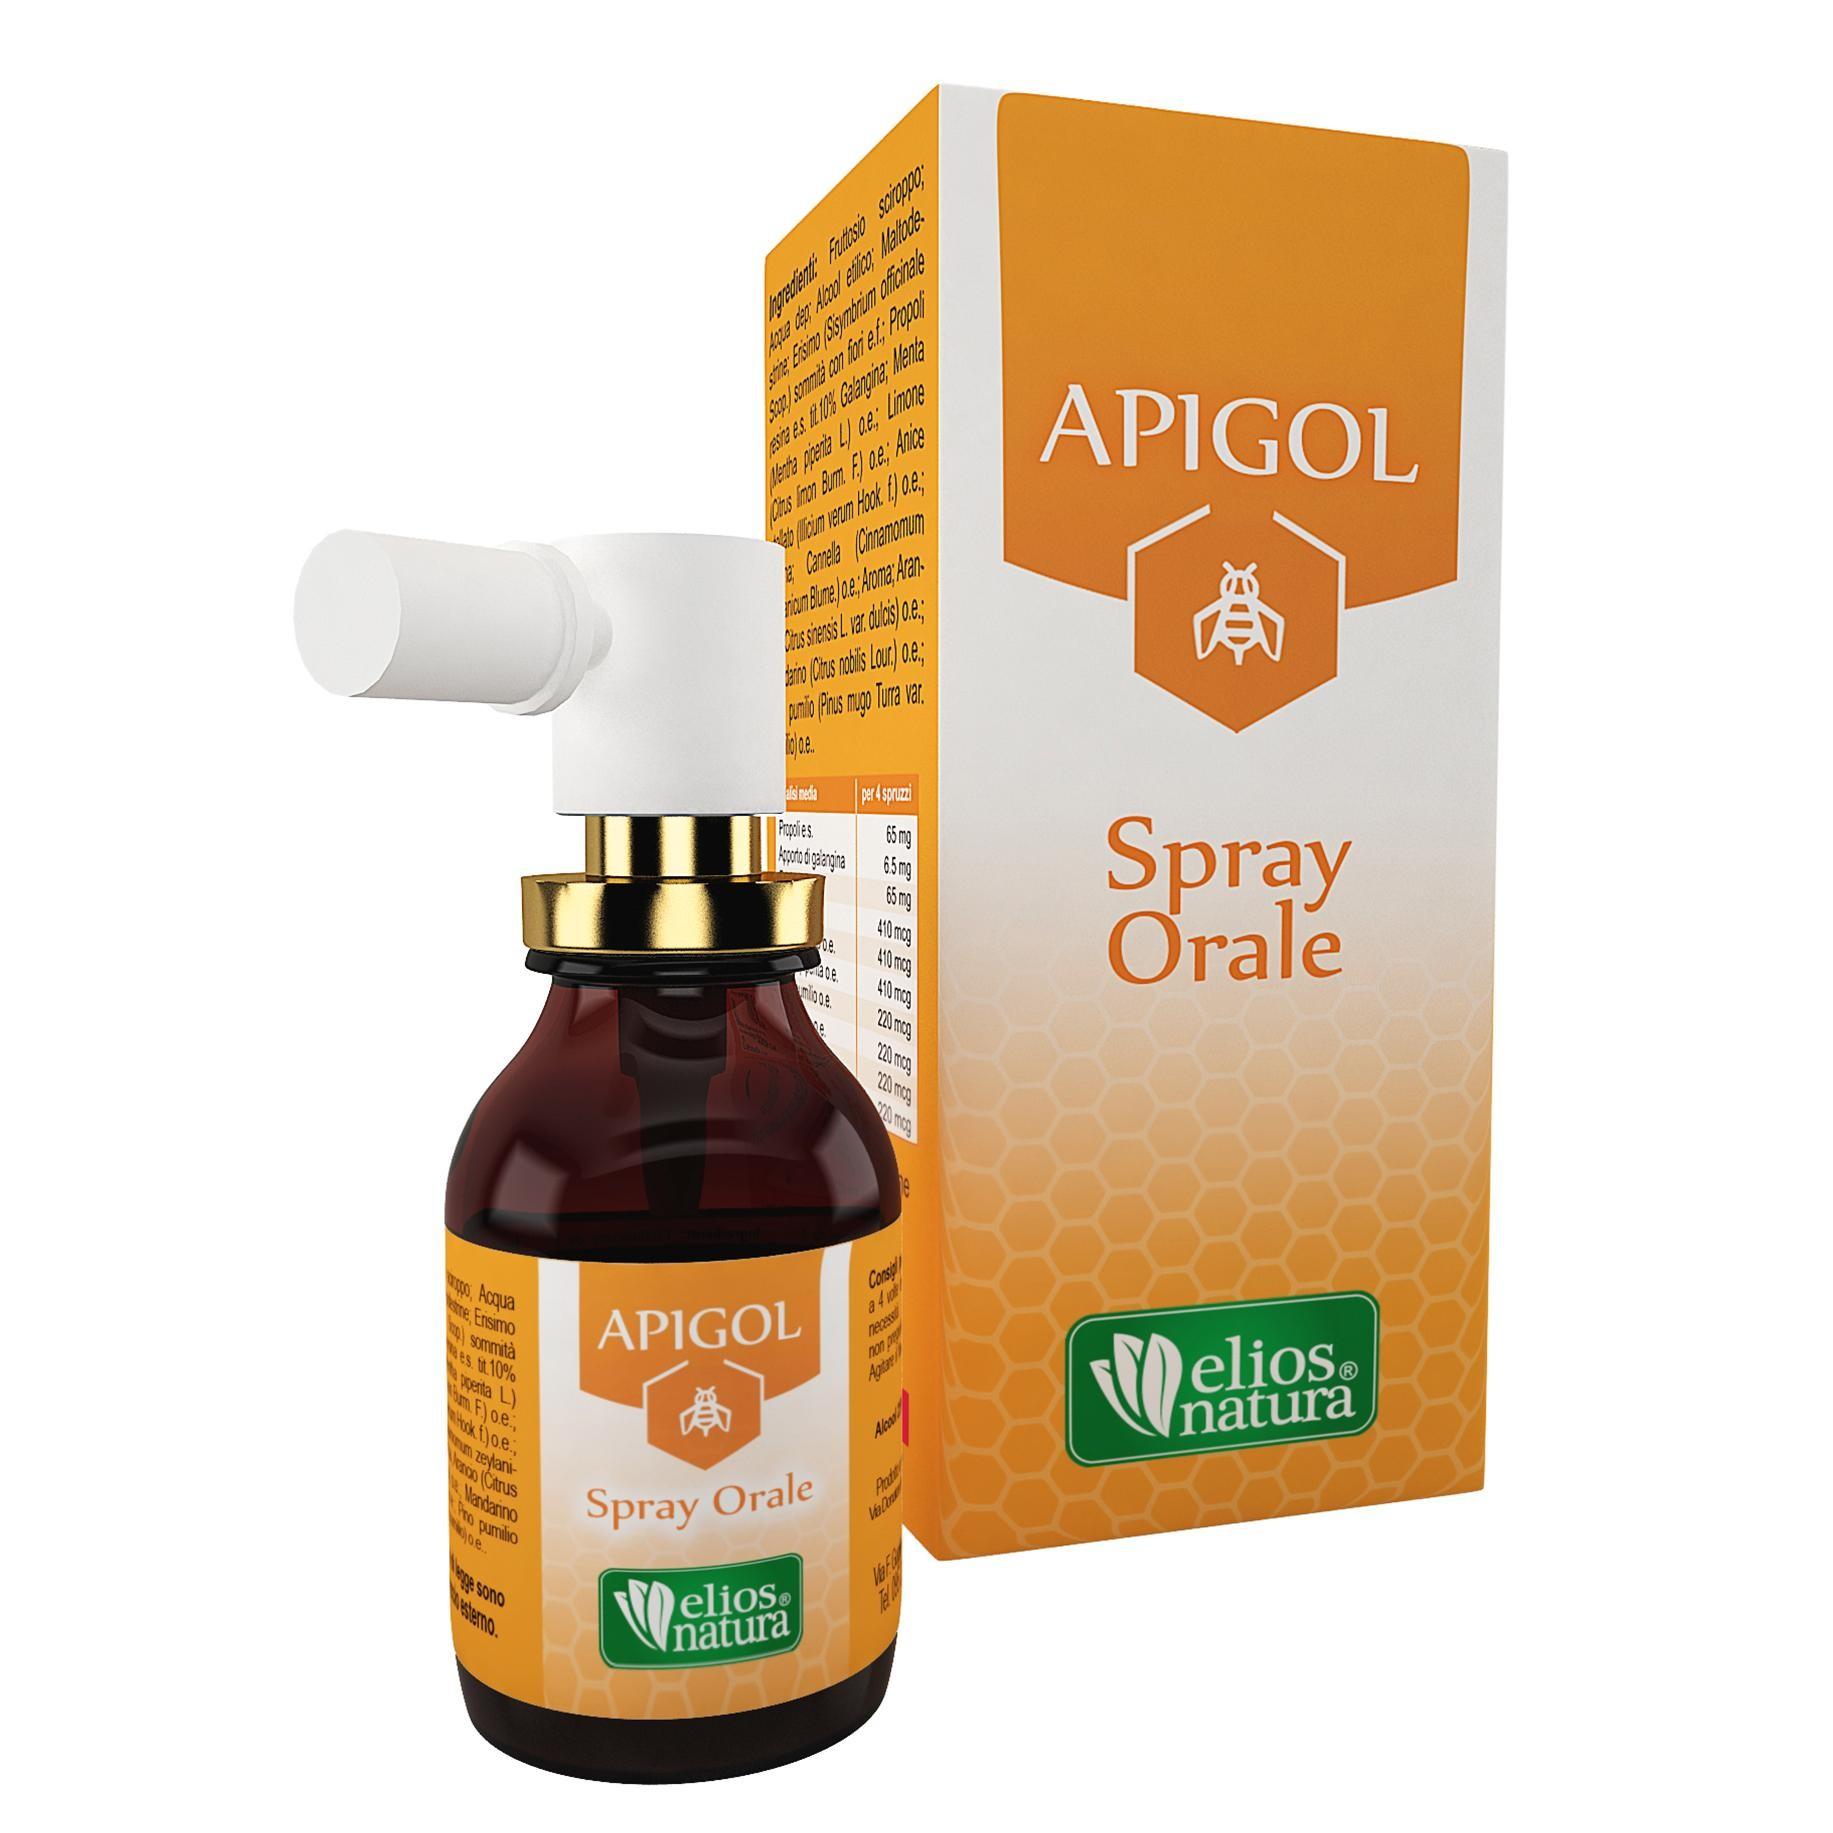 Tosse: Apigol spray orale